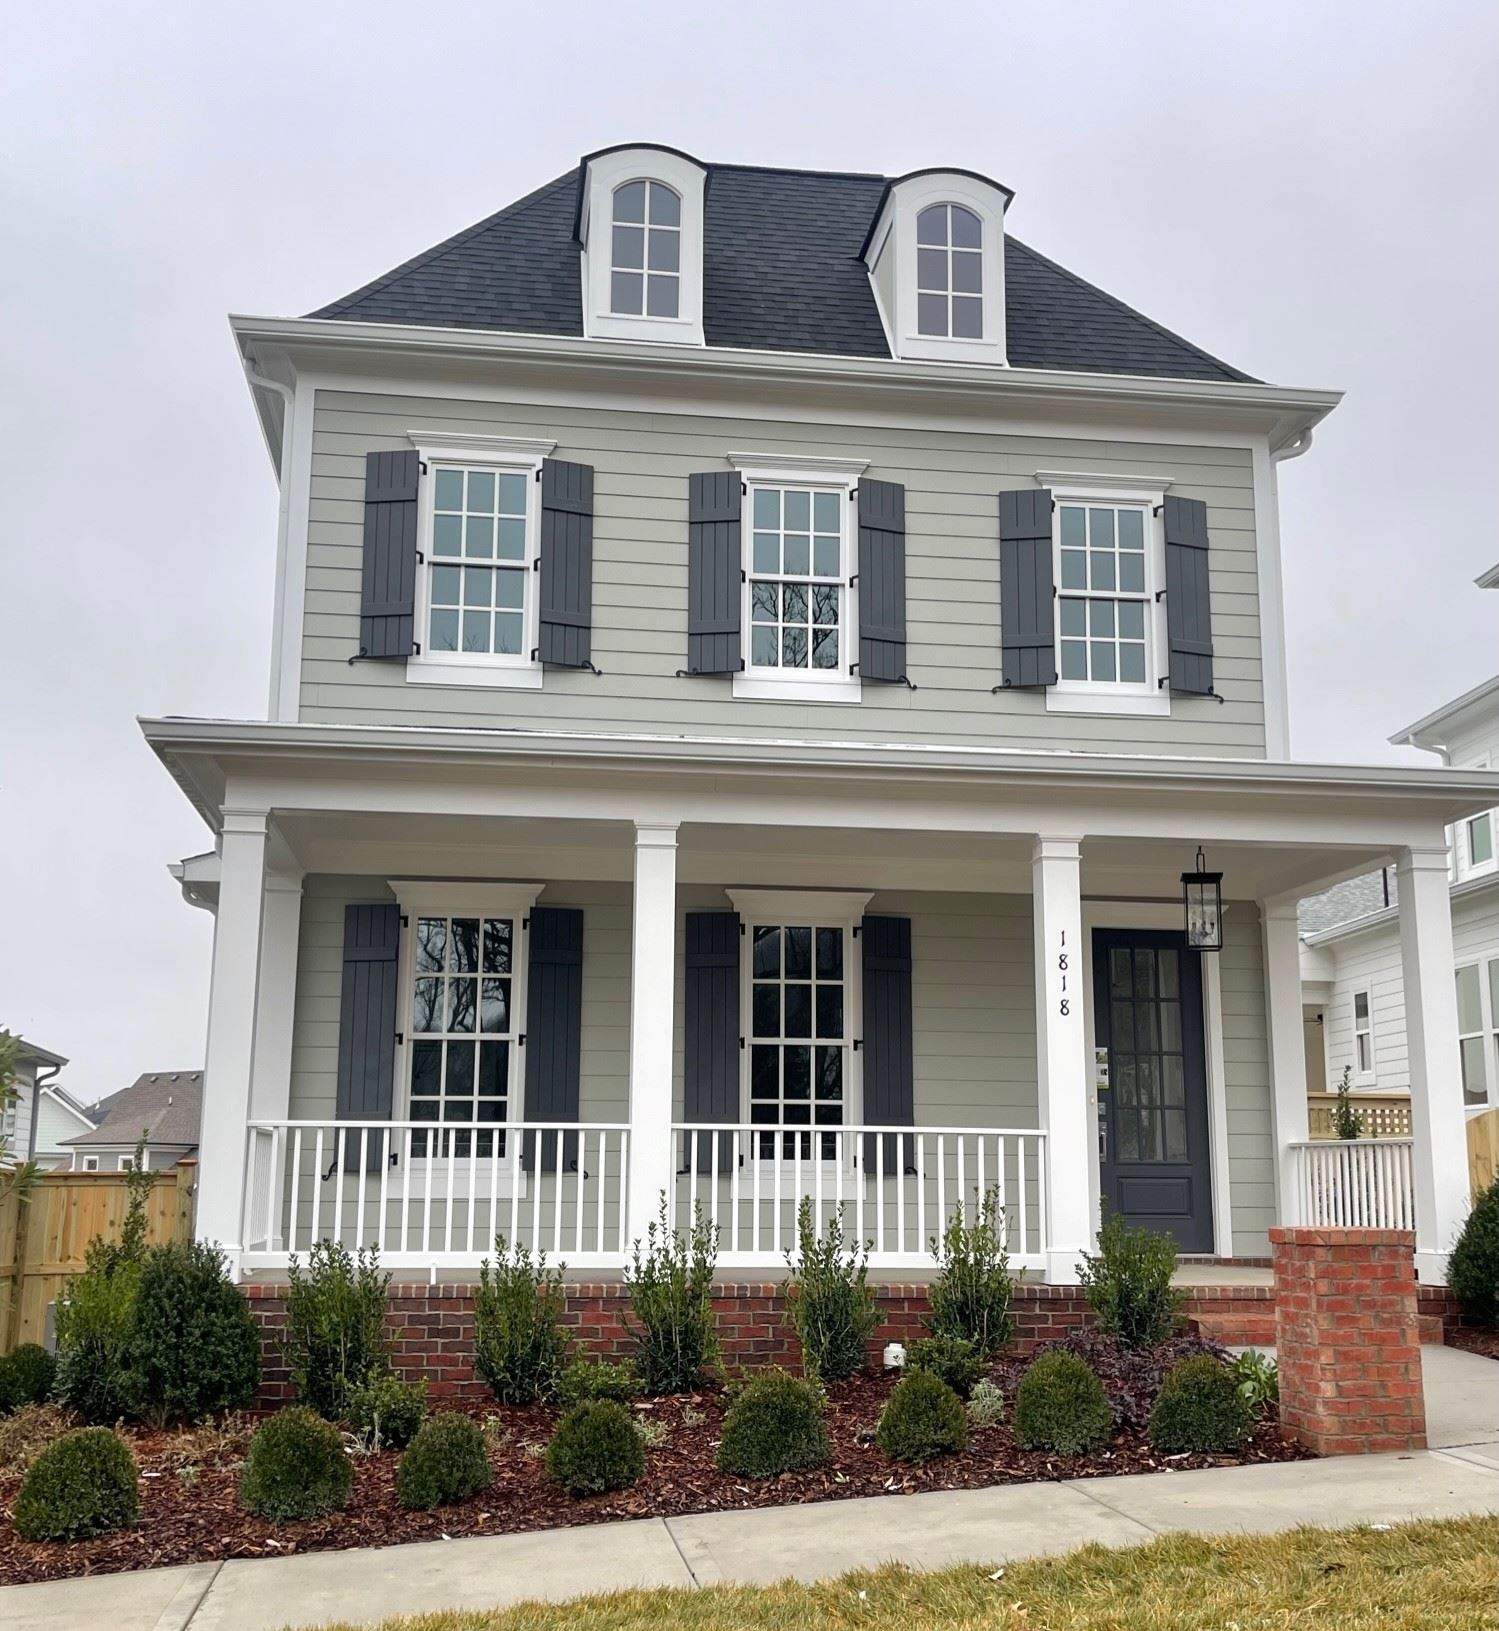 Photo of 1818 Eliot Road, Lot # 2188, Franklin, TN 37064 (MLS # 2303036)